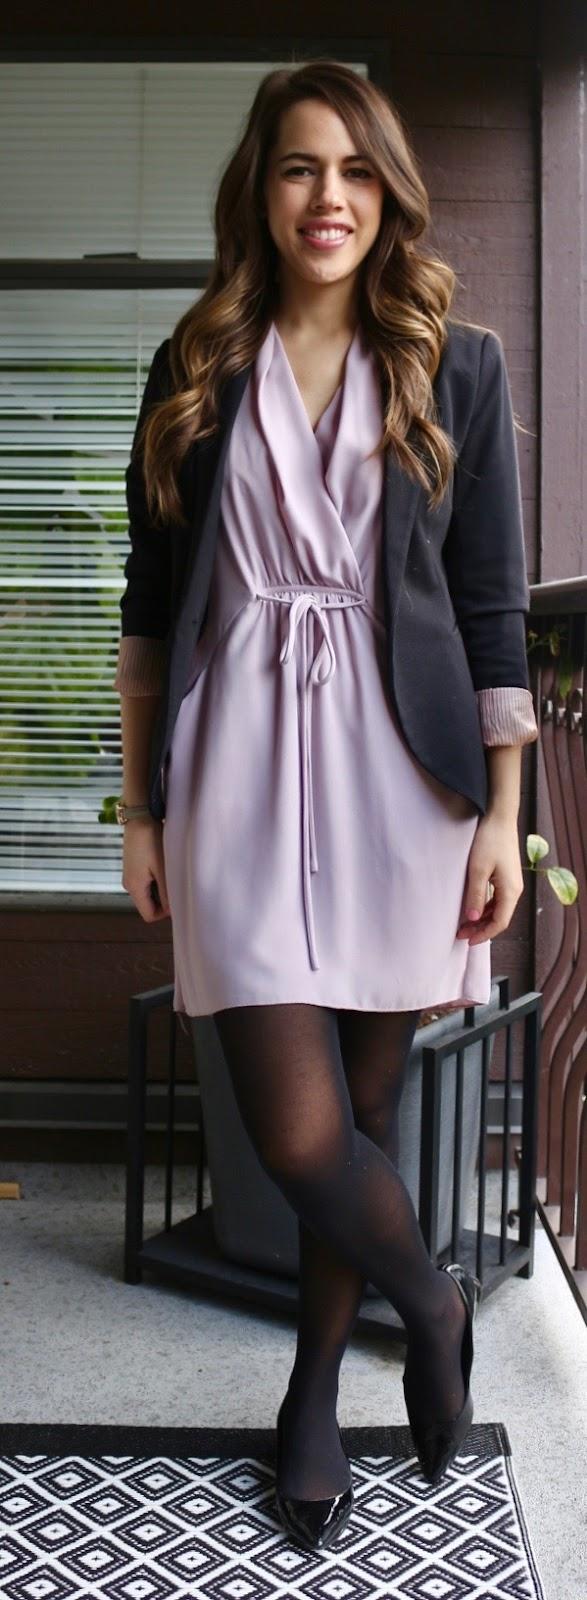 Jules in Flats - Aritzia Wilfred Sabine Dress with Blazer